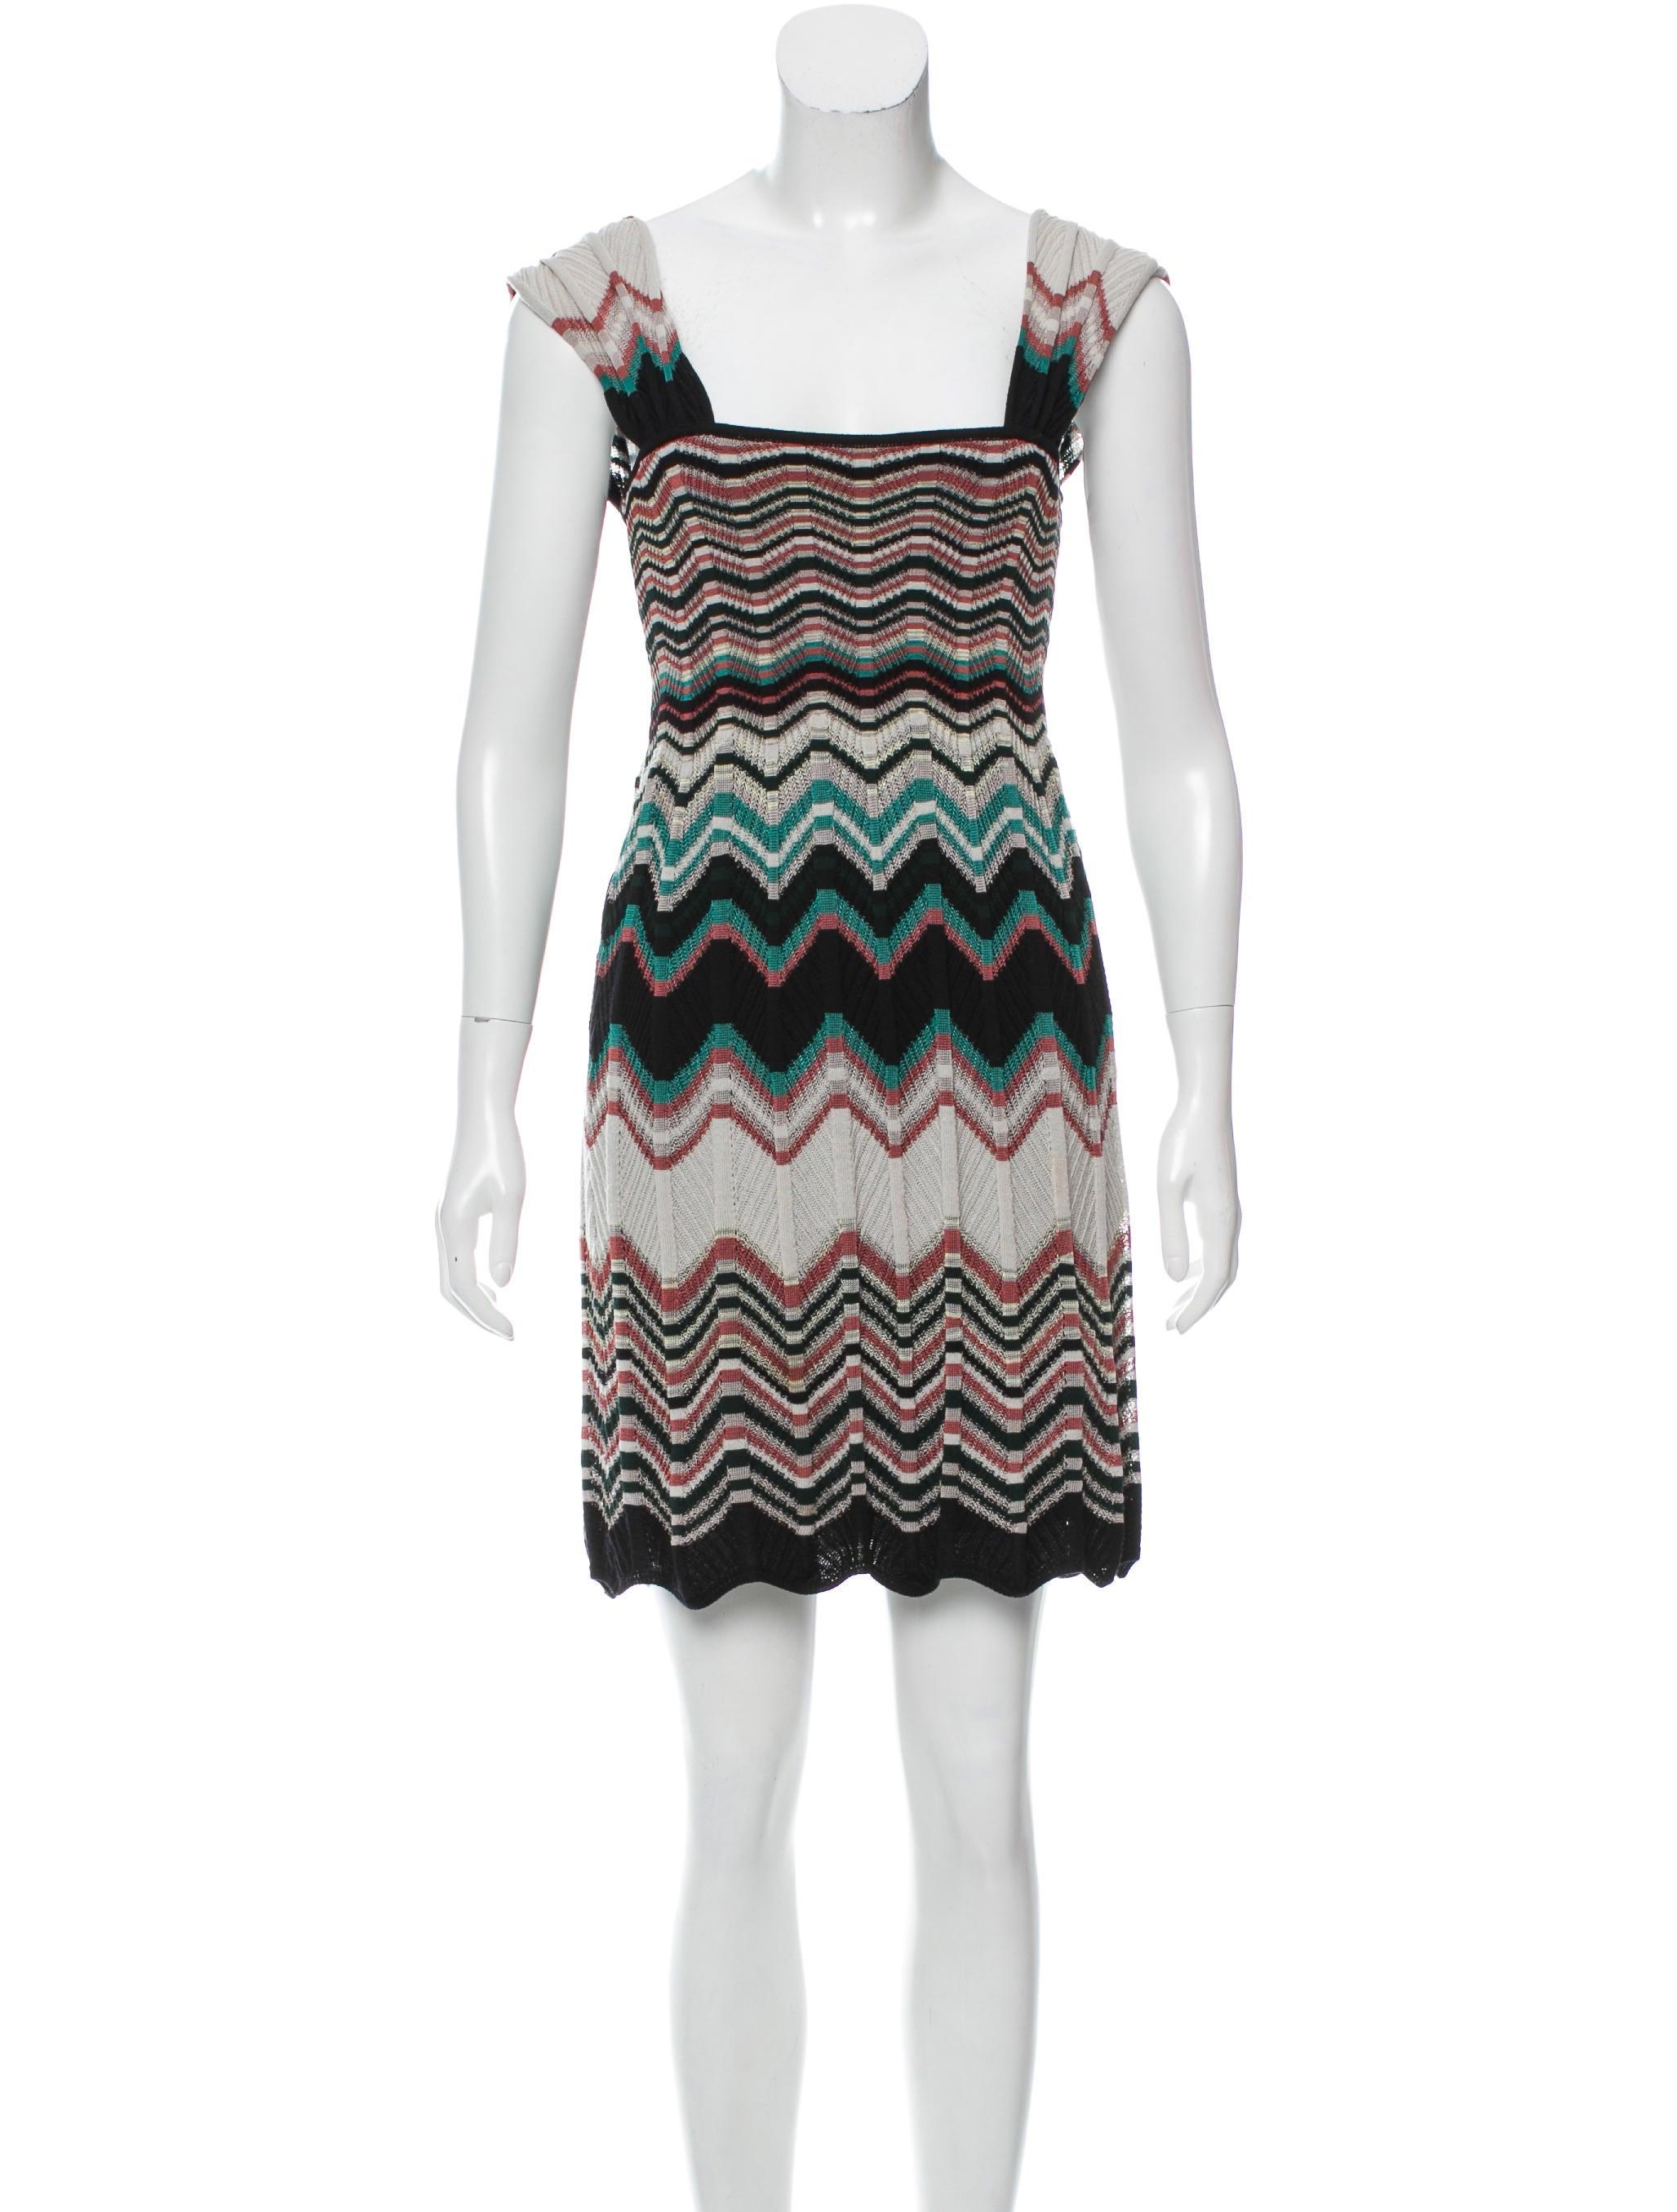 m missoni patterned mini dress clothing wm437998 the realreal. Black Bedroom Furniture Sets. Home Design Ideas